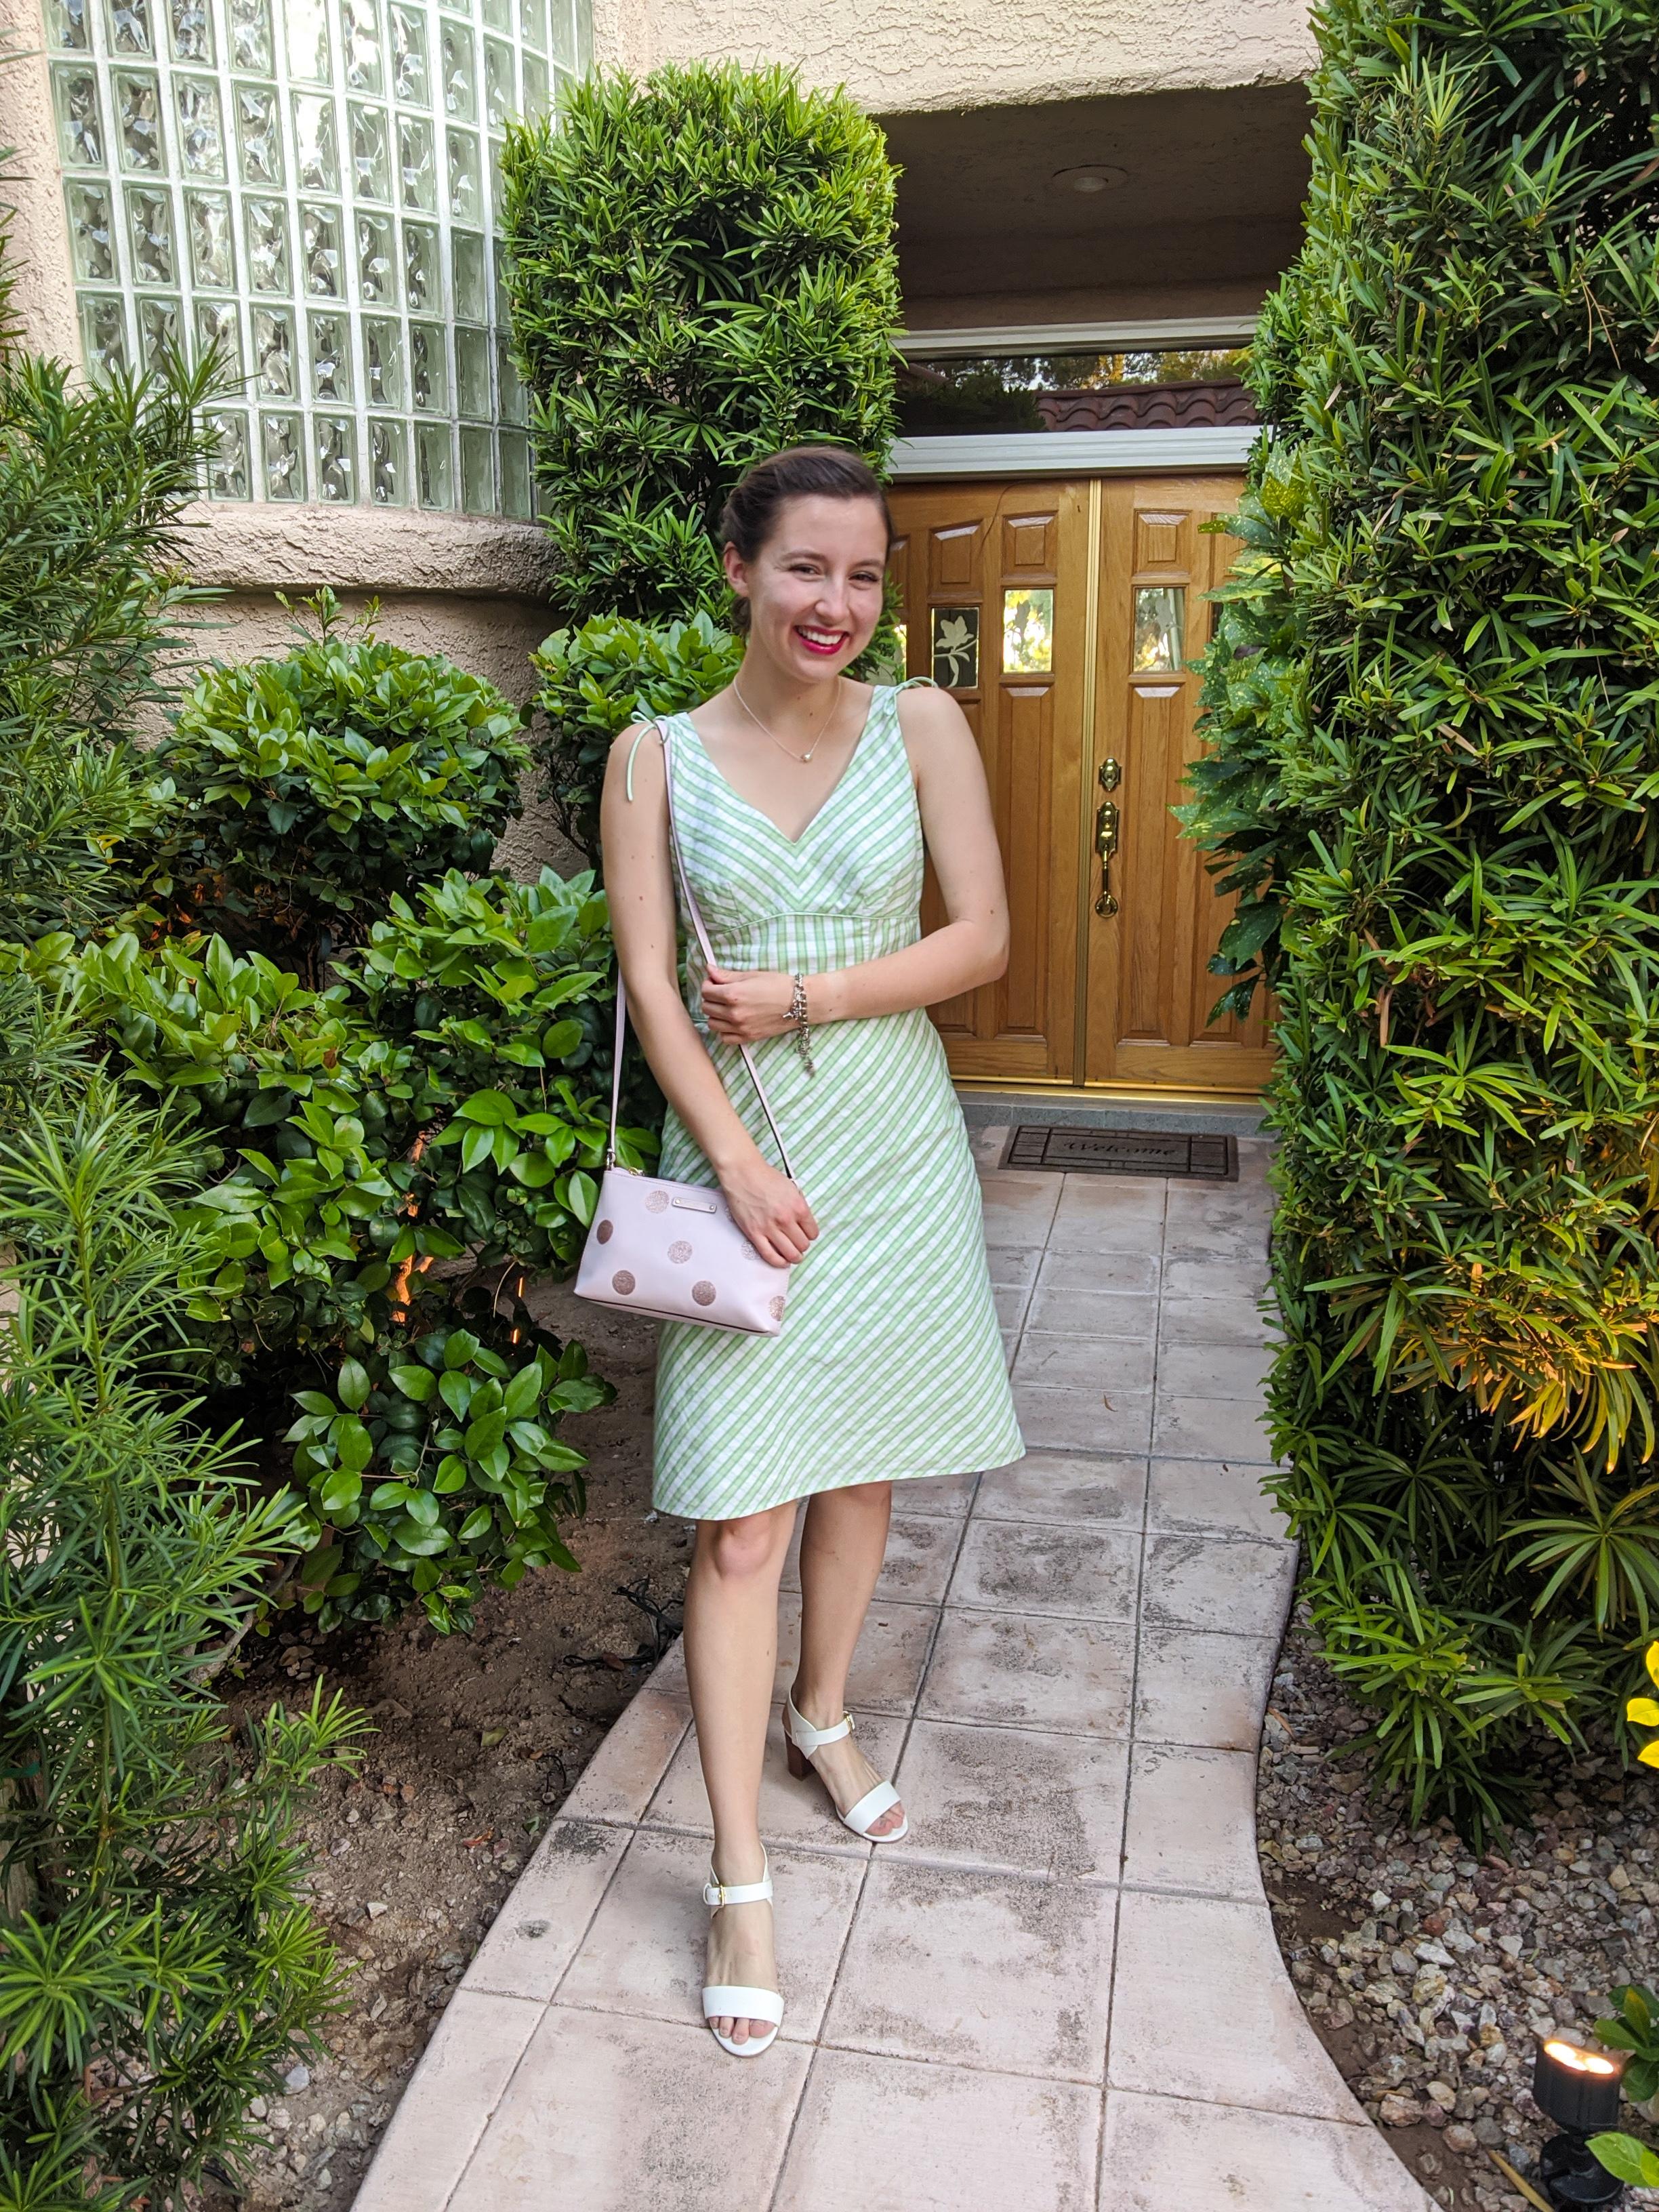 green-sundress-elegance-retro-style-white-heels